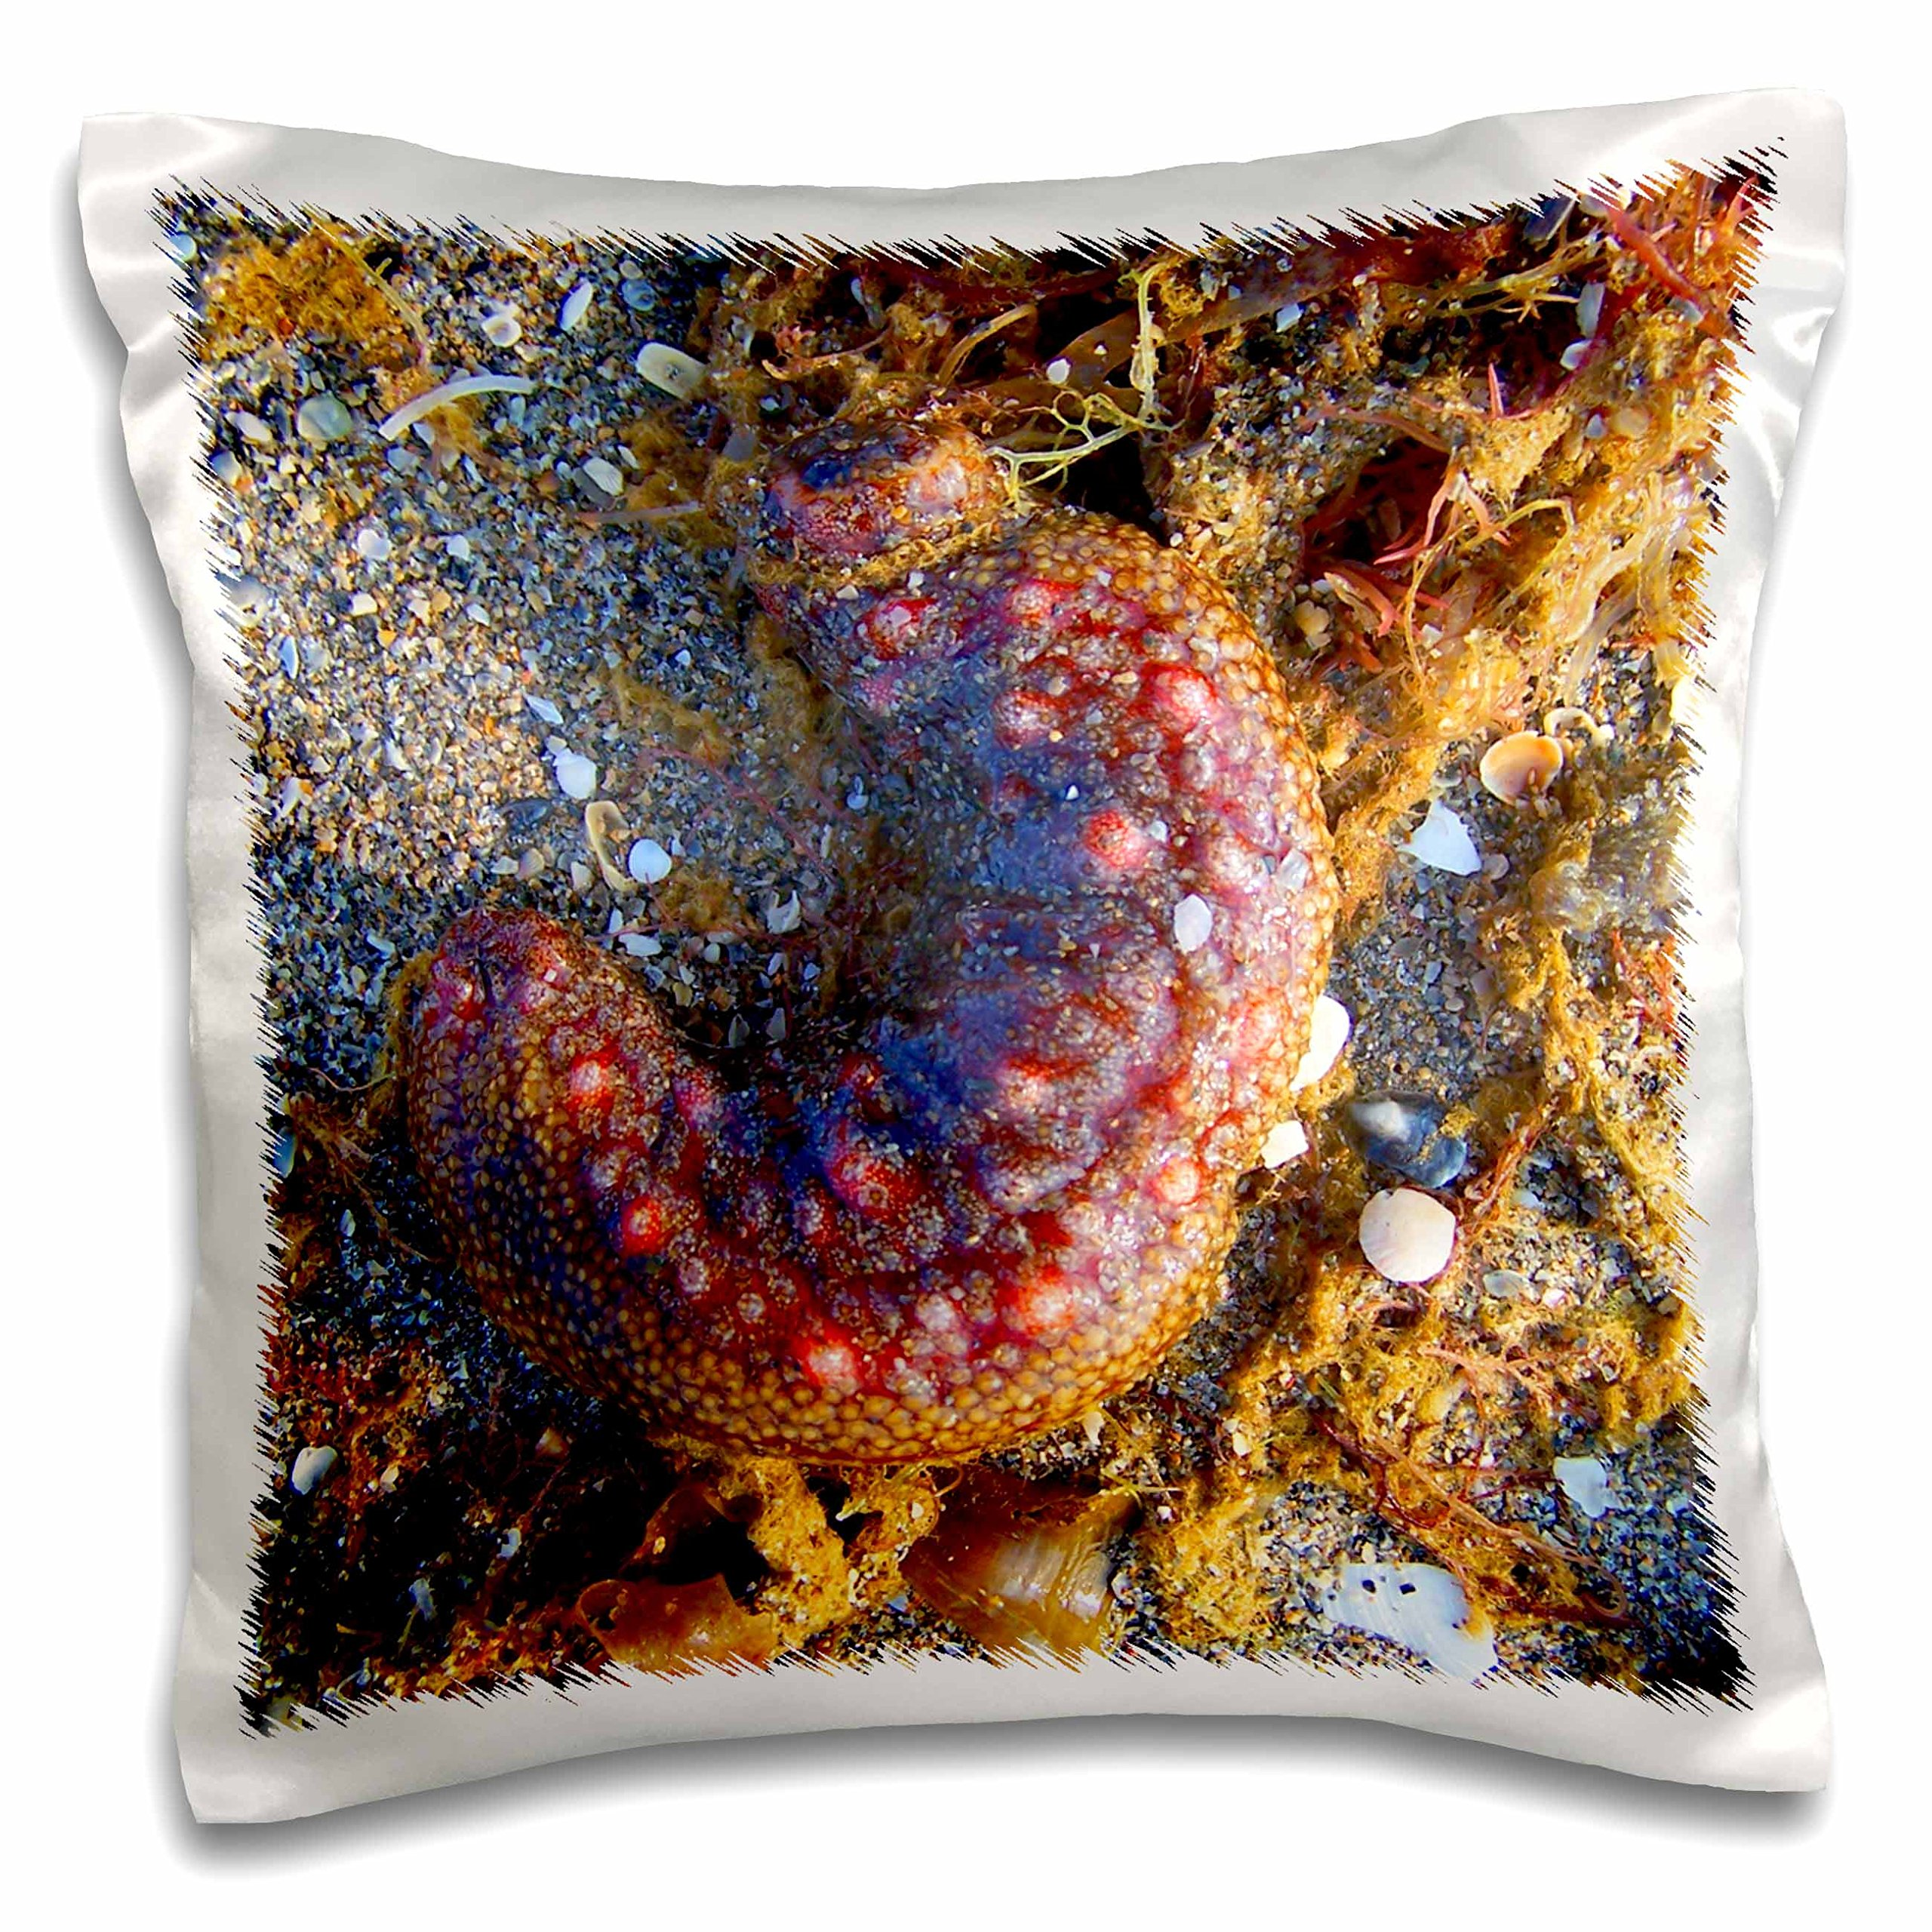 3dRose Sea Cucumber Red Animal Pillow Case, 16 x 16''